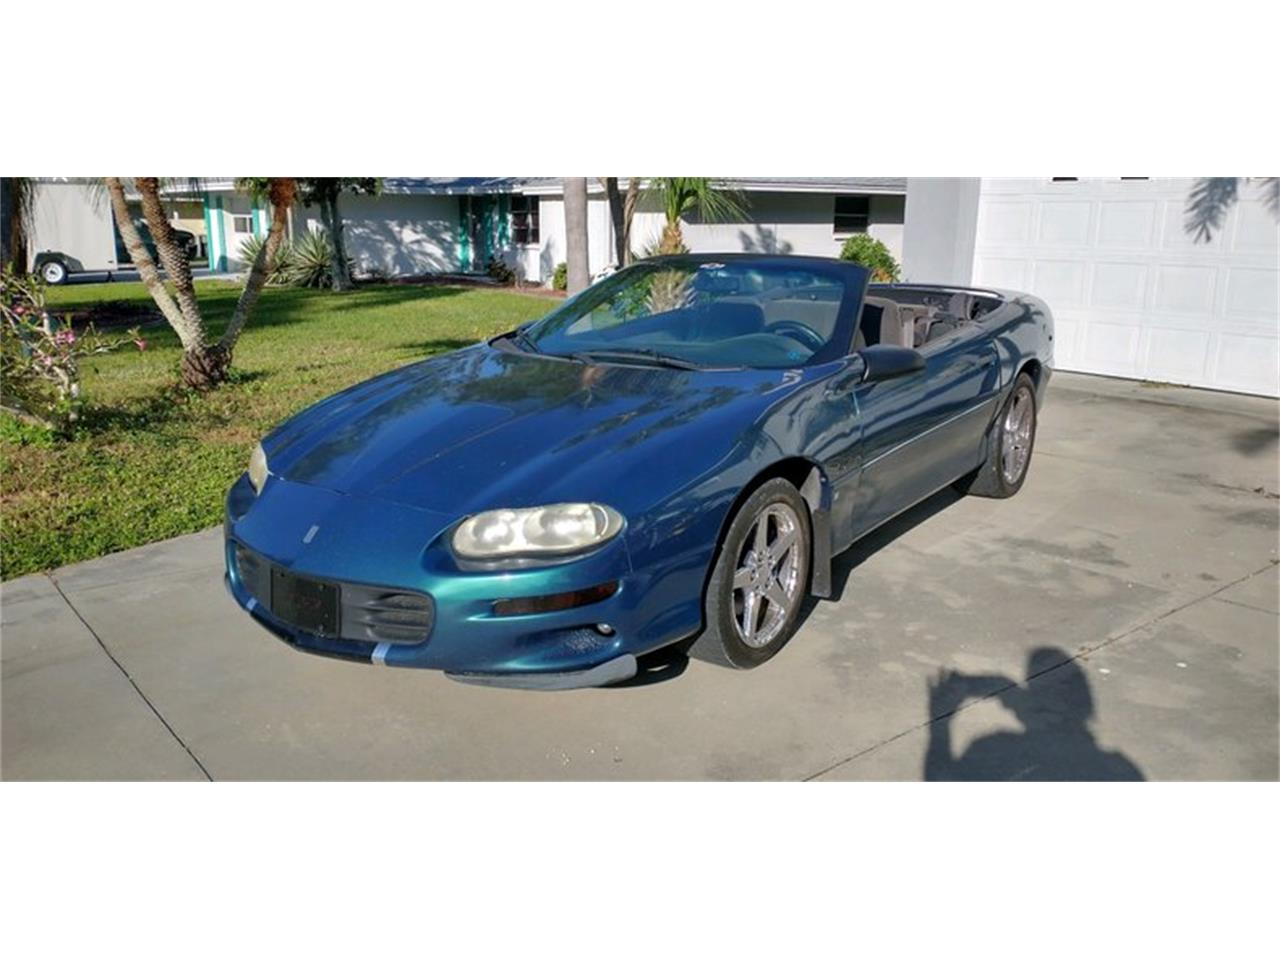 2000 Chevrolet Camaro (CC-1419324) for sale in Punta Gorda, Florida